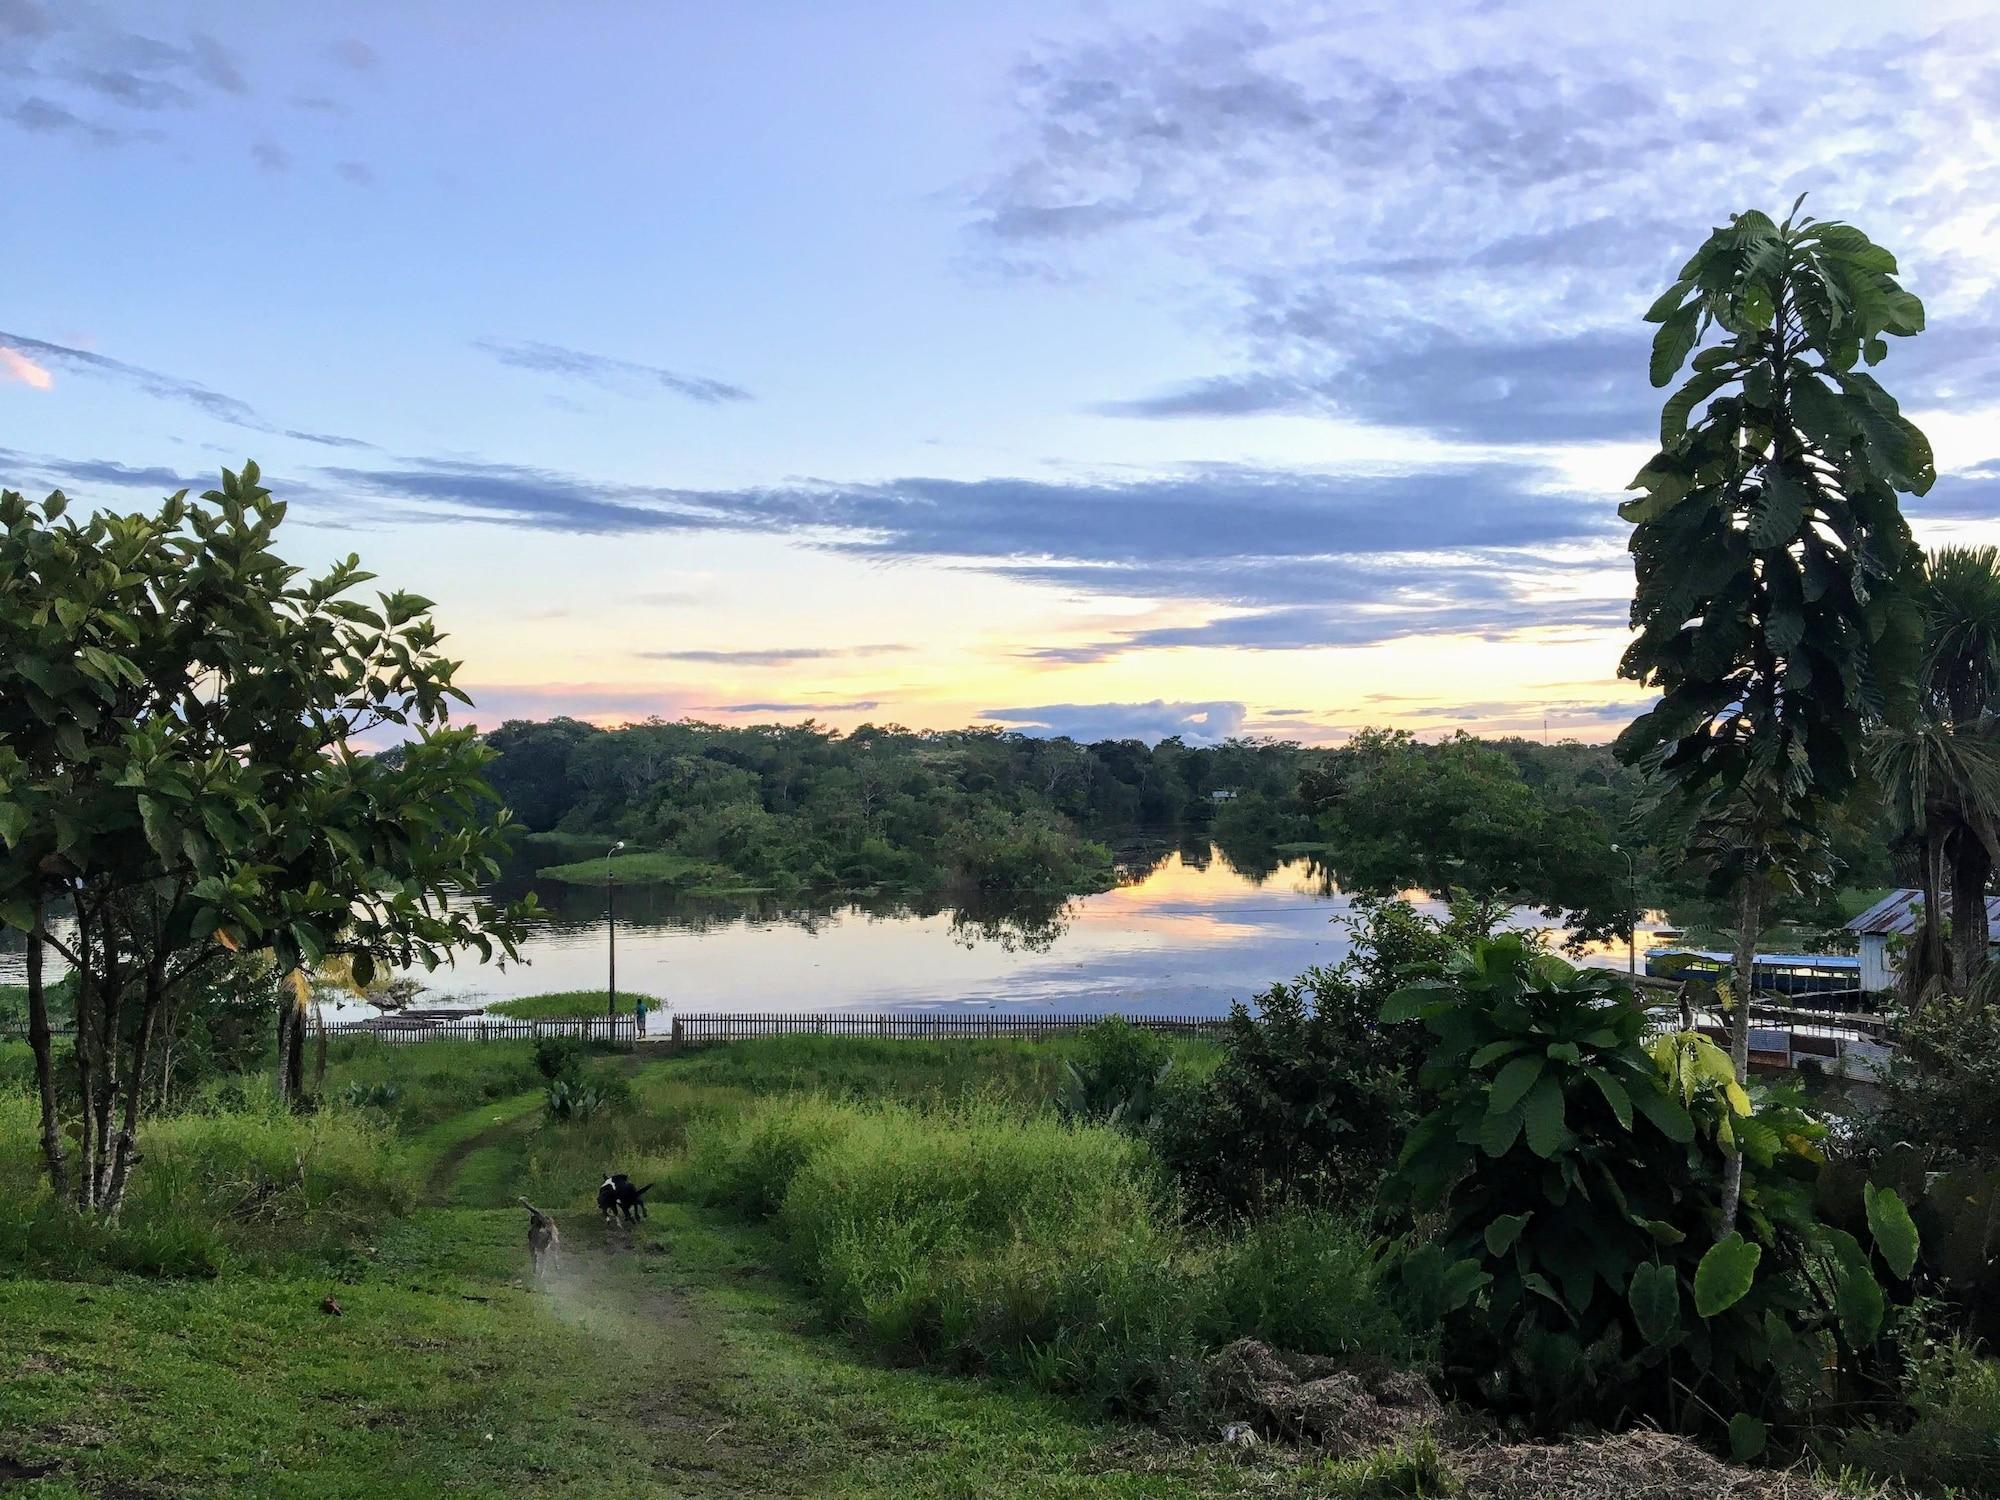 Selva Vida Lodge & Retreat Center, Maynas